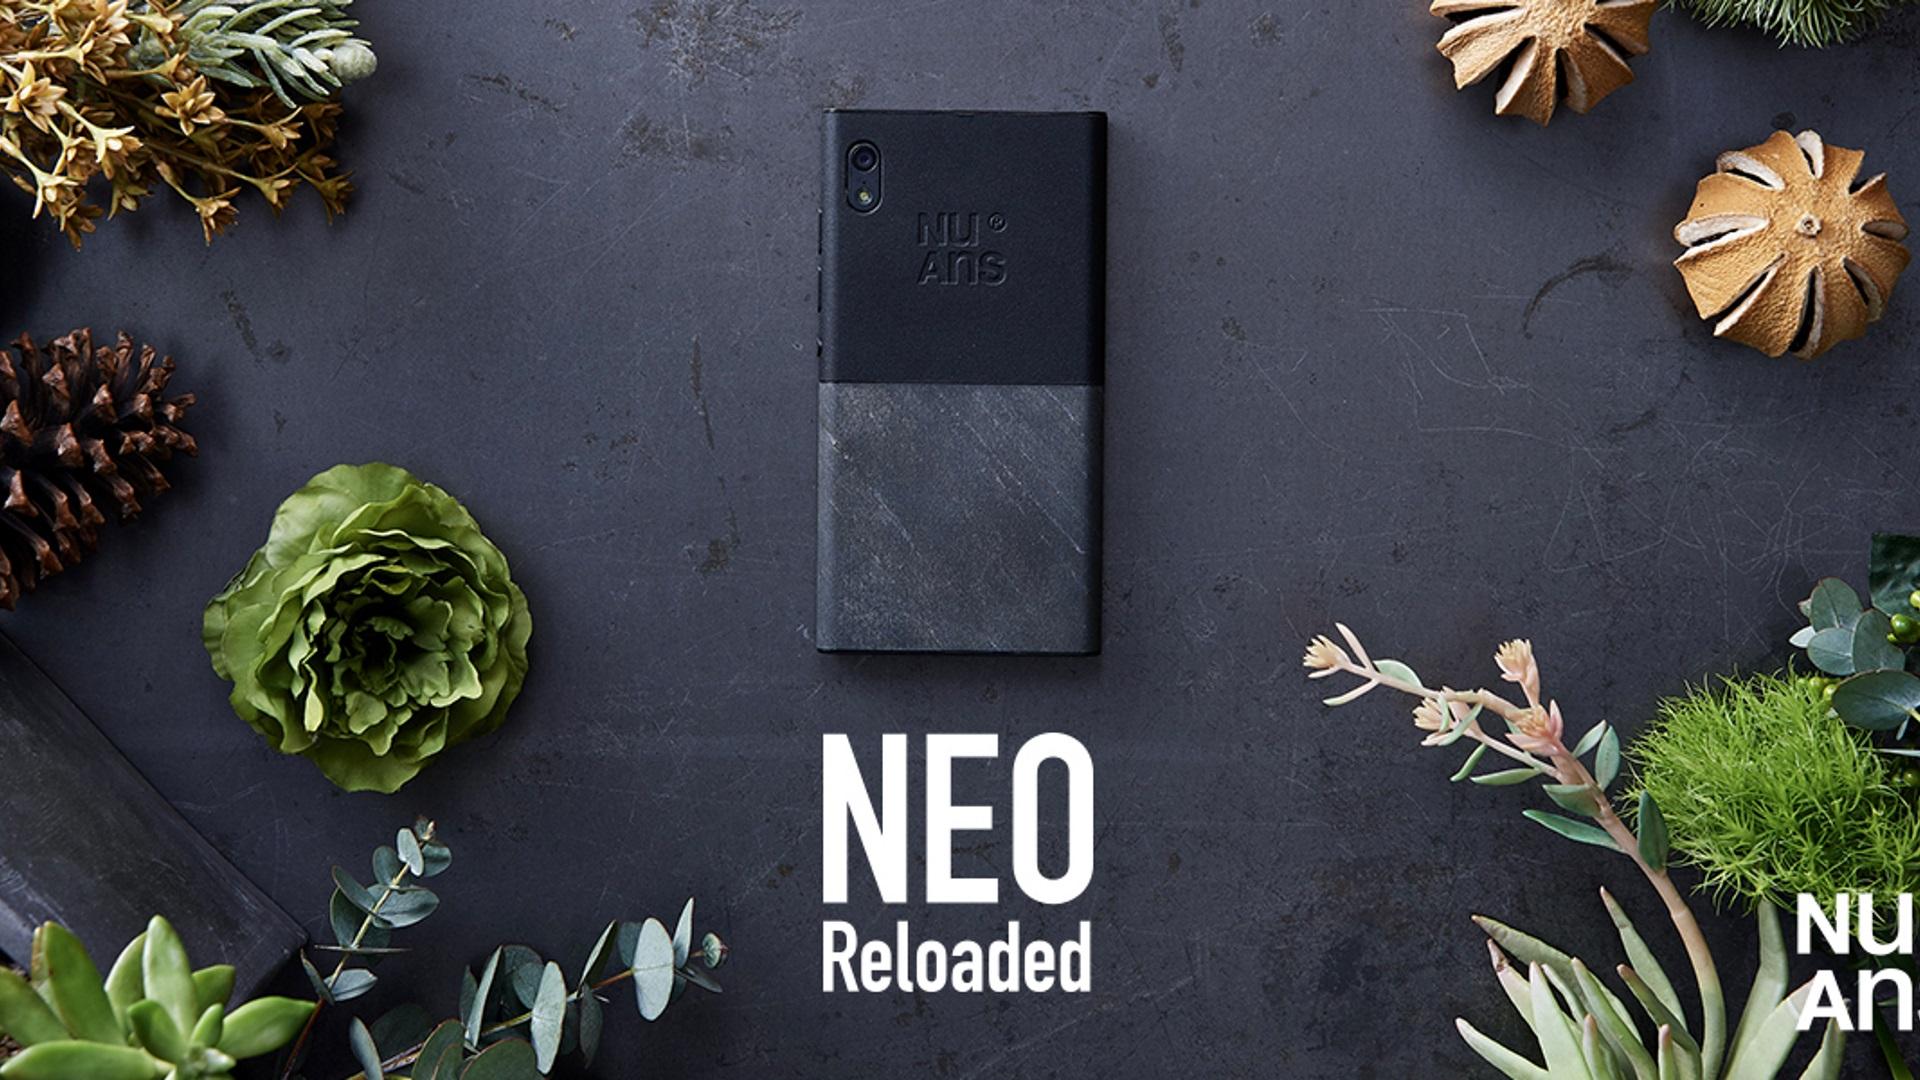 「NuAns NEO [Reloaded]」の発売が6月上旬に延期